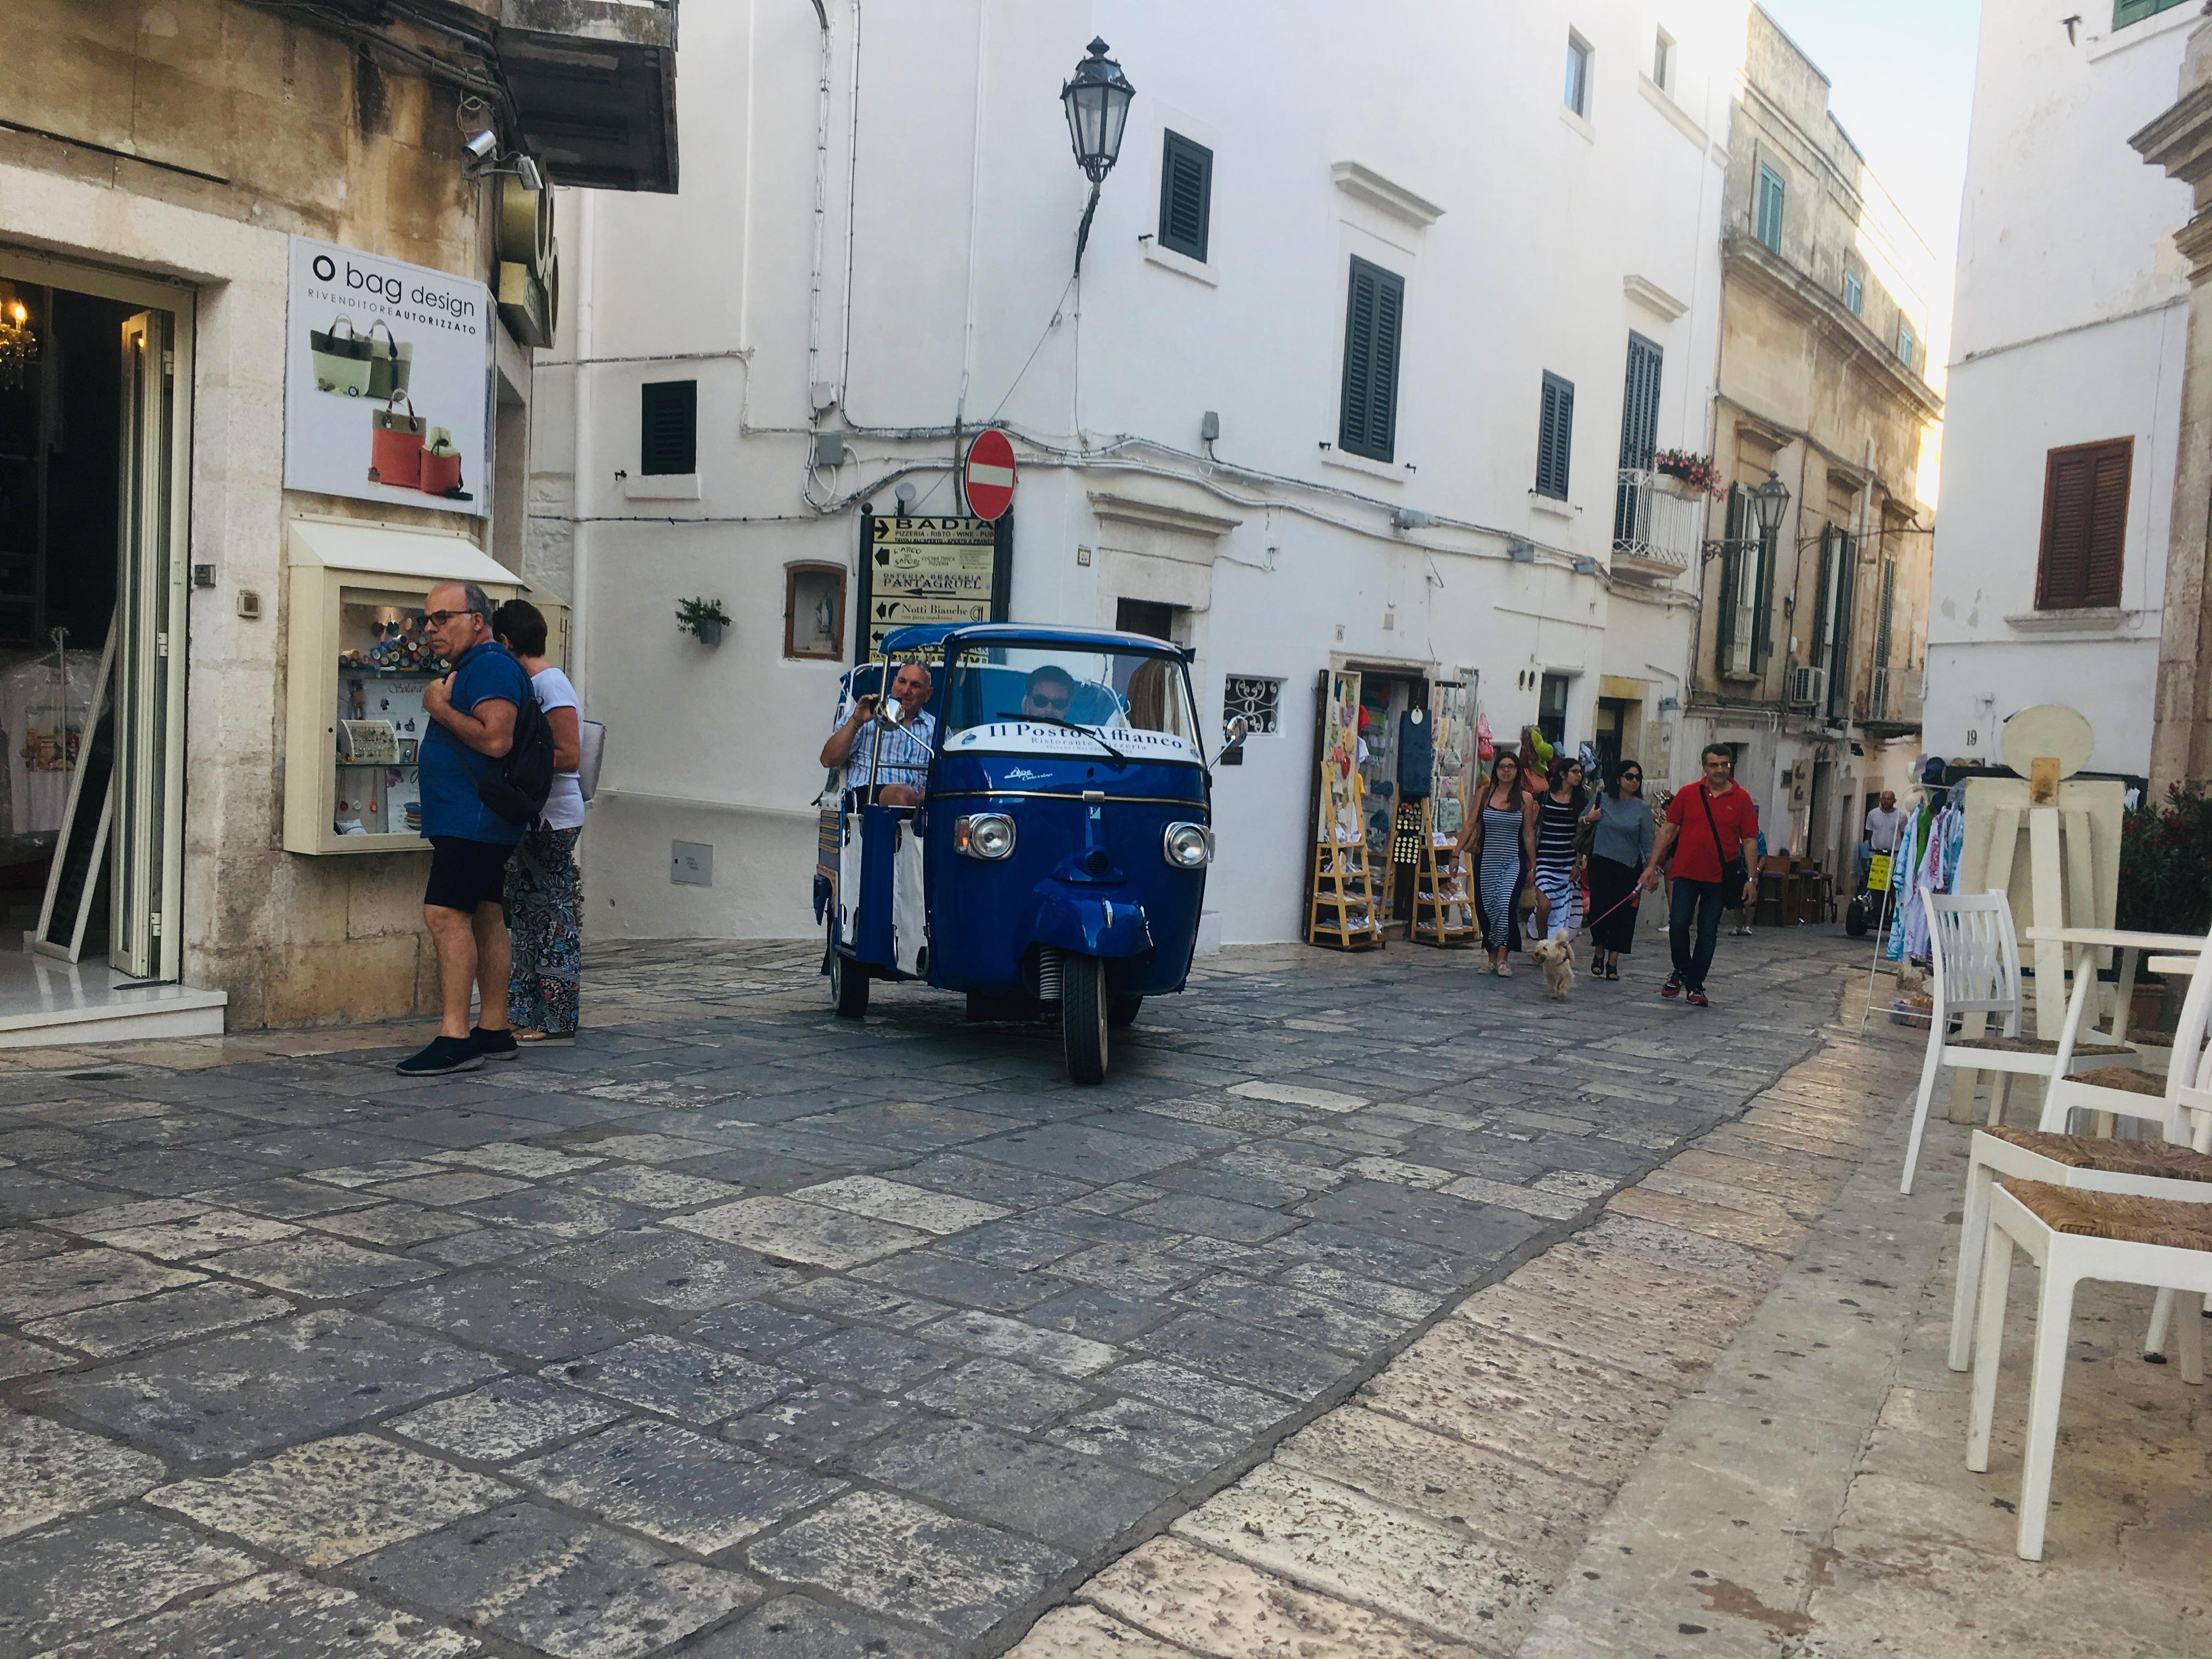 ulica w Ostuni Via Catedrale